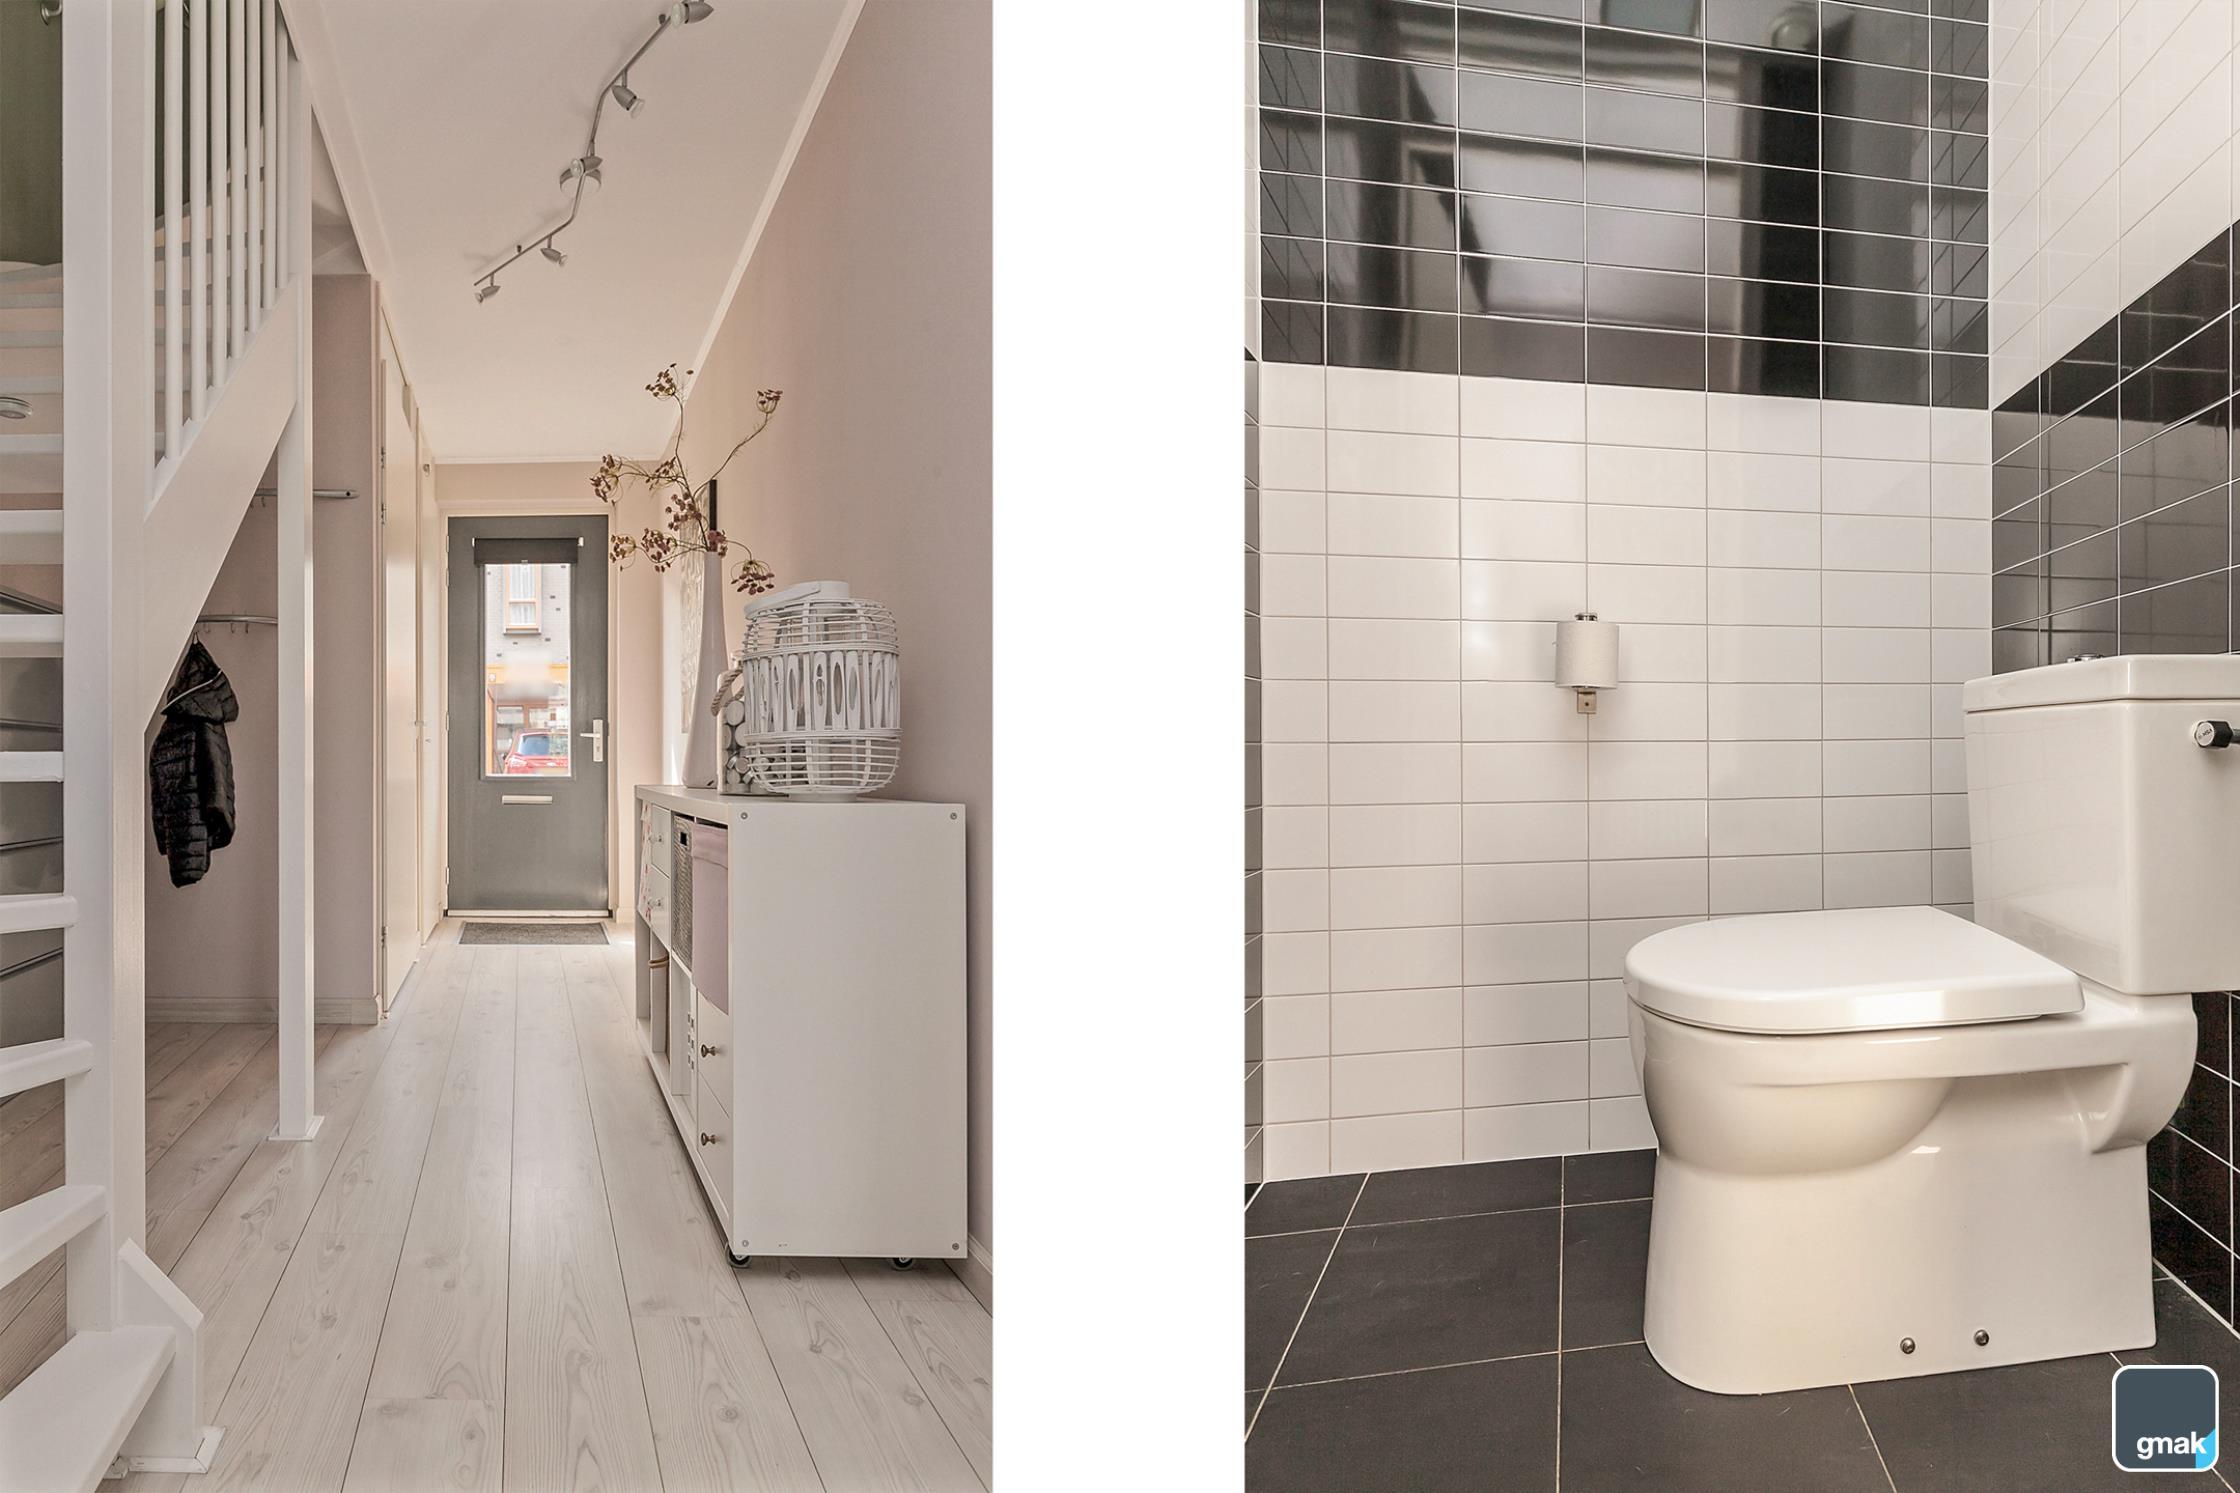 Hal beneden - Toilet Hal